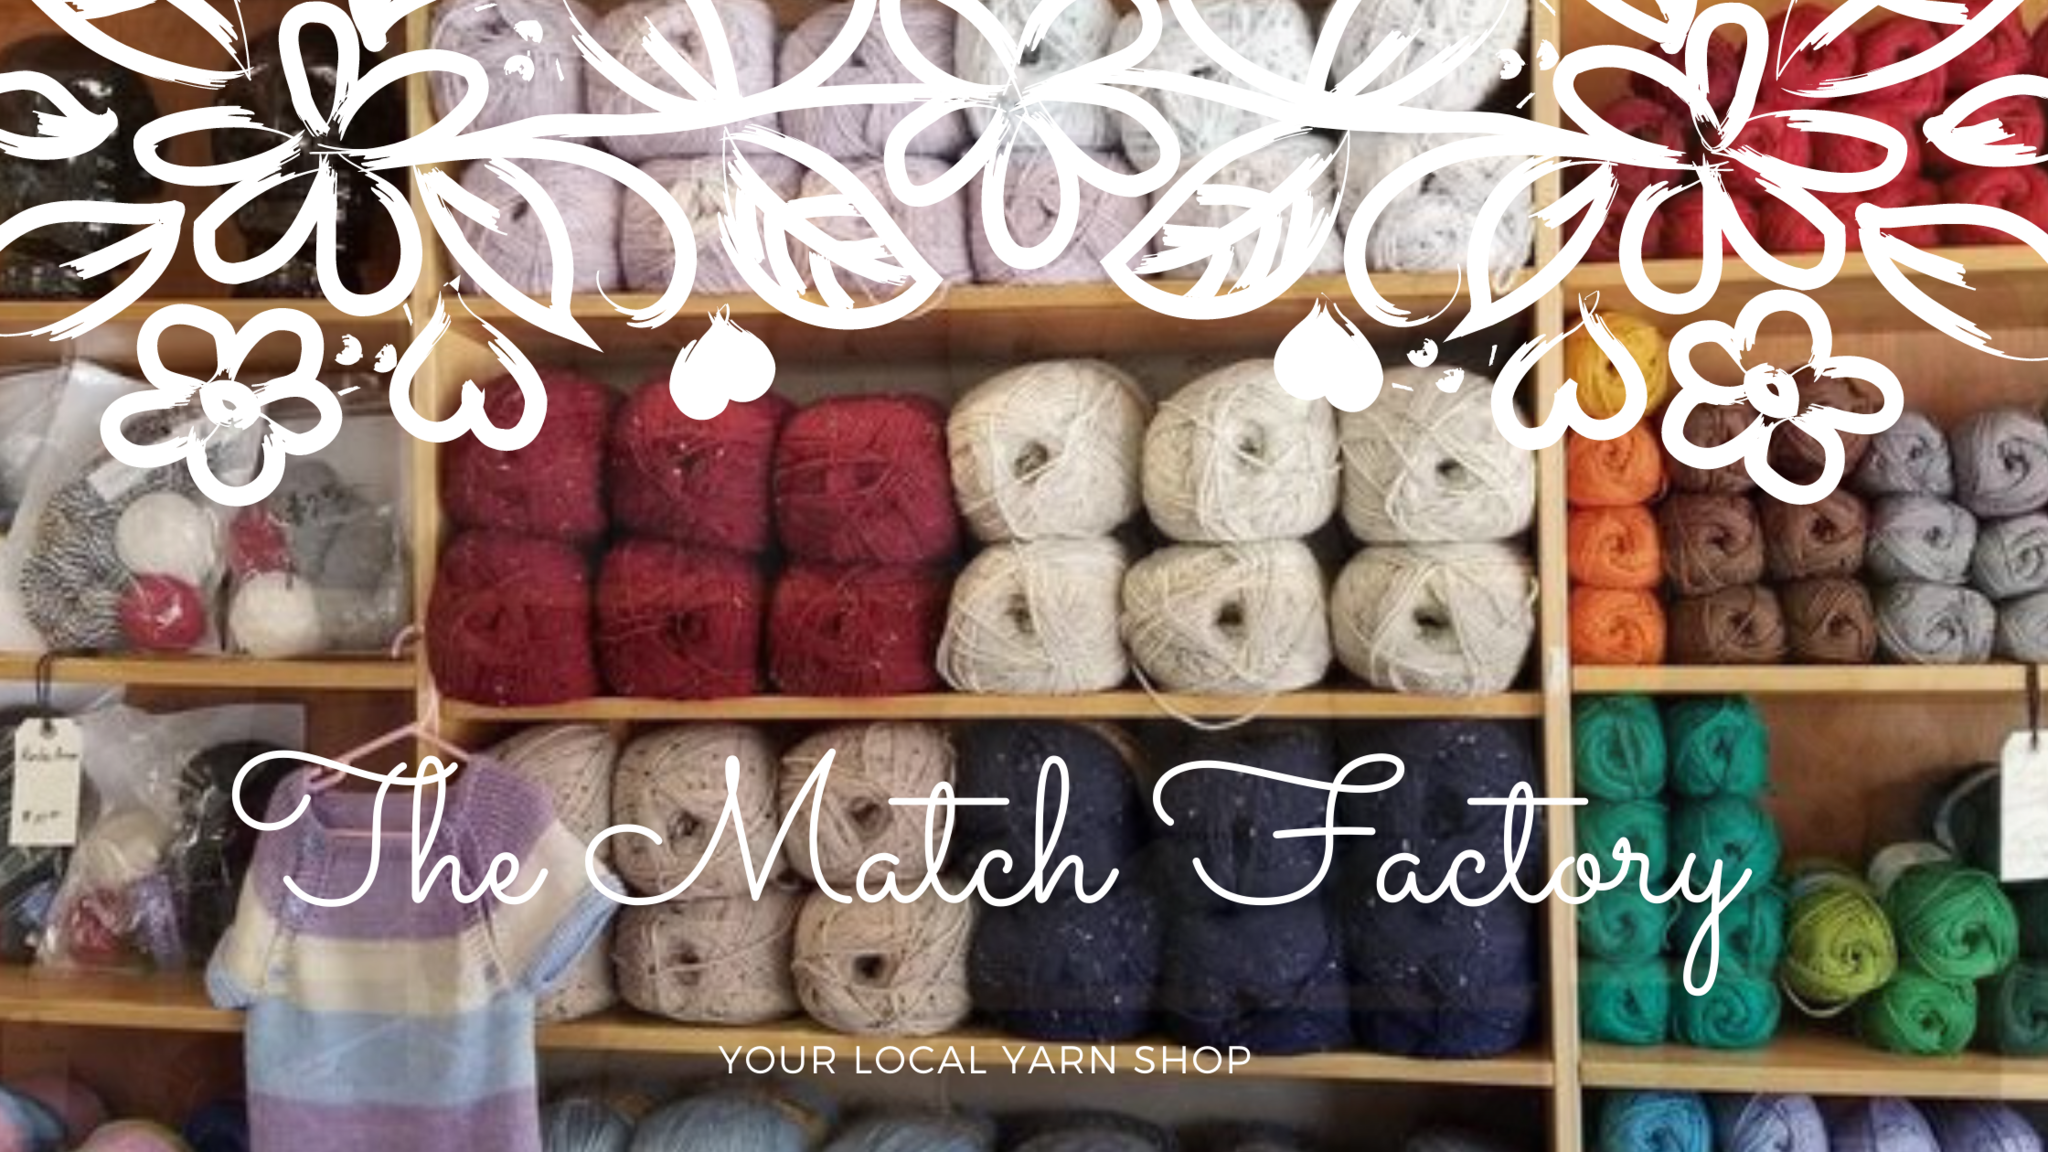 Your Local Yarn shop